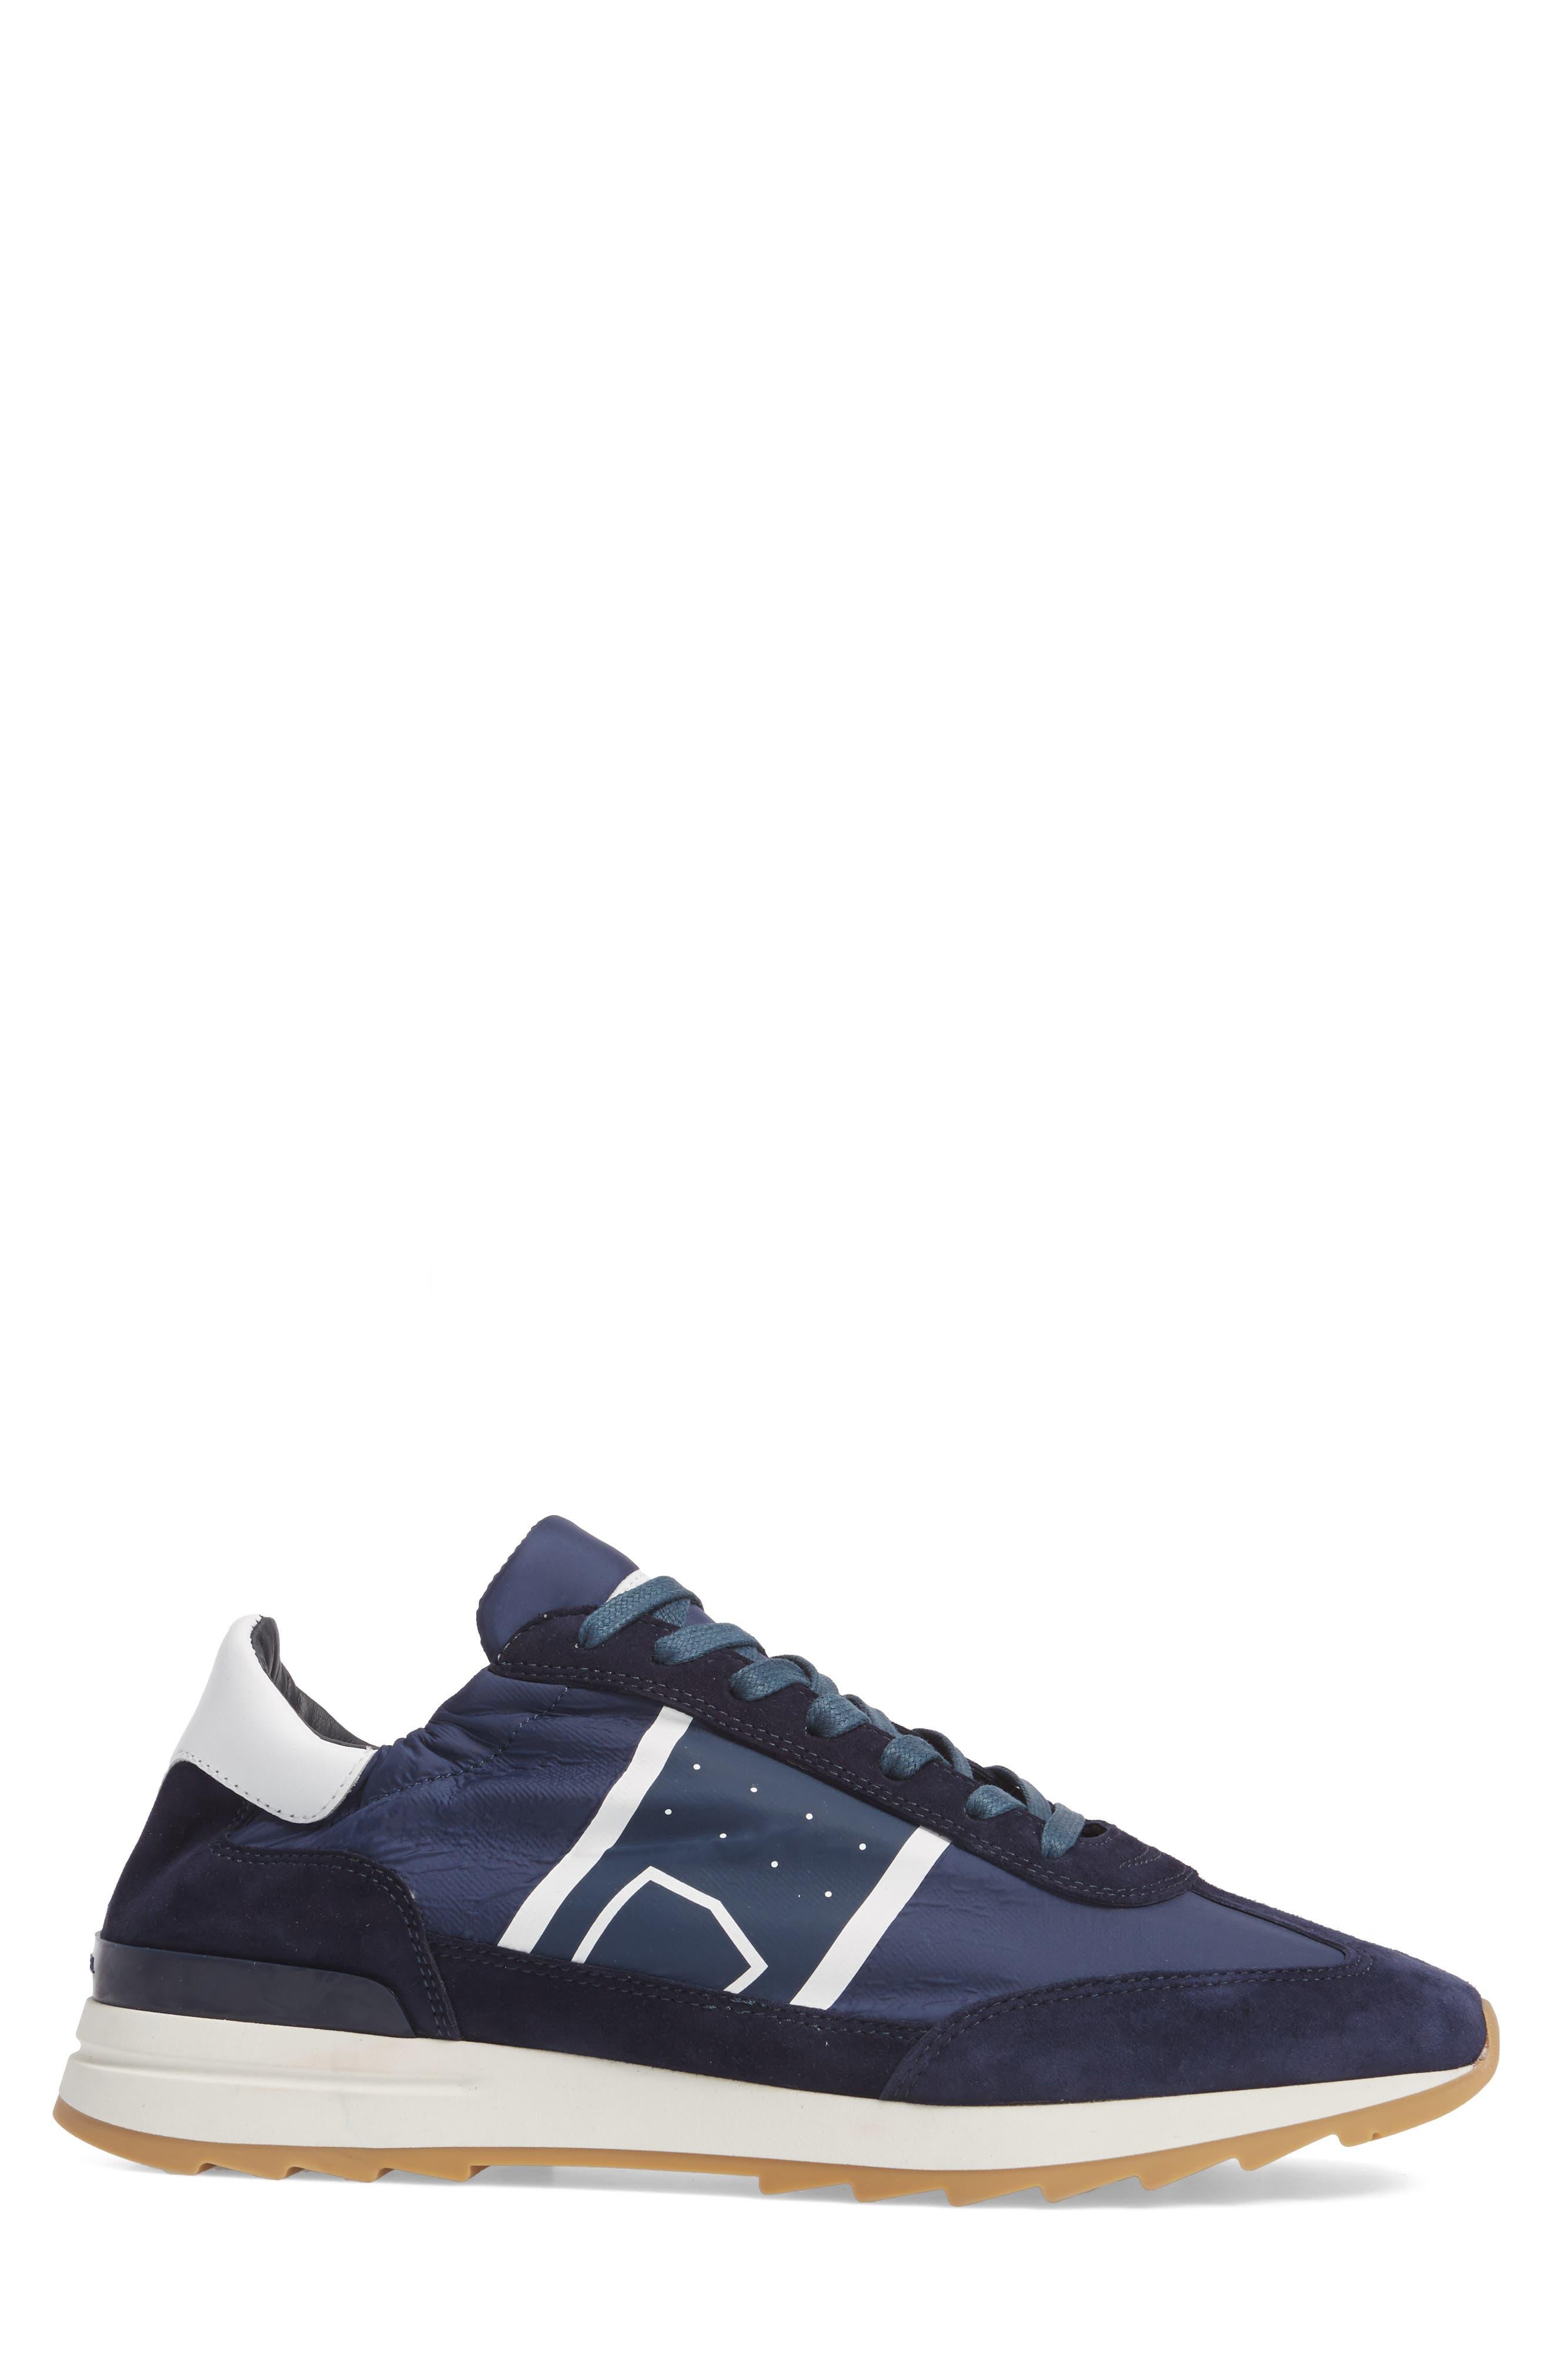 Toujours Sneaker,                             Alternate thumbnail 3, color,                             Blue/ Blue